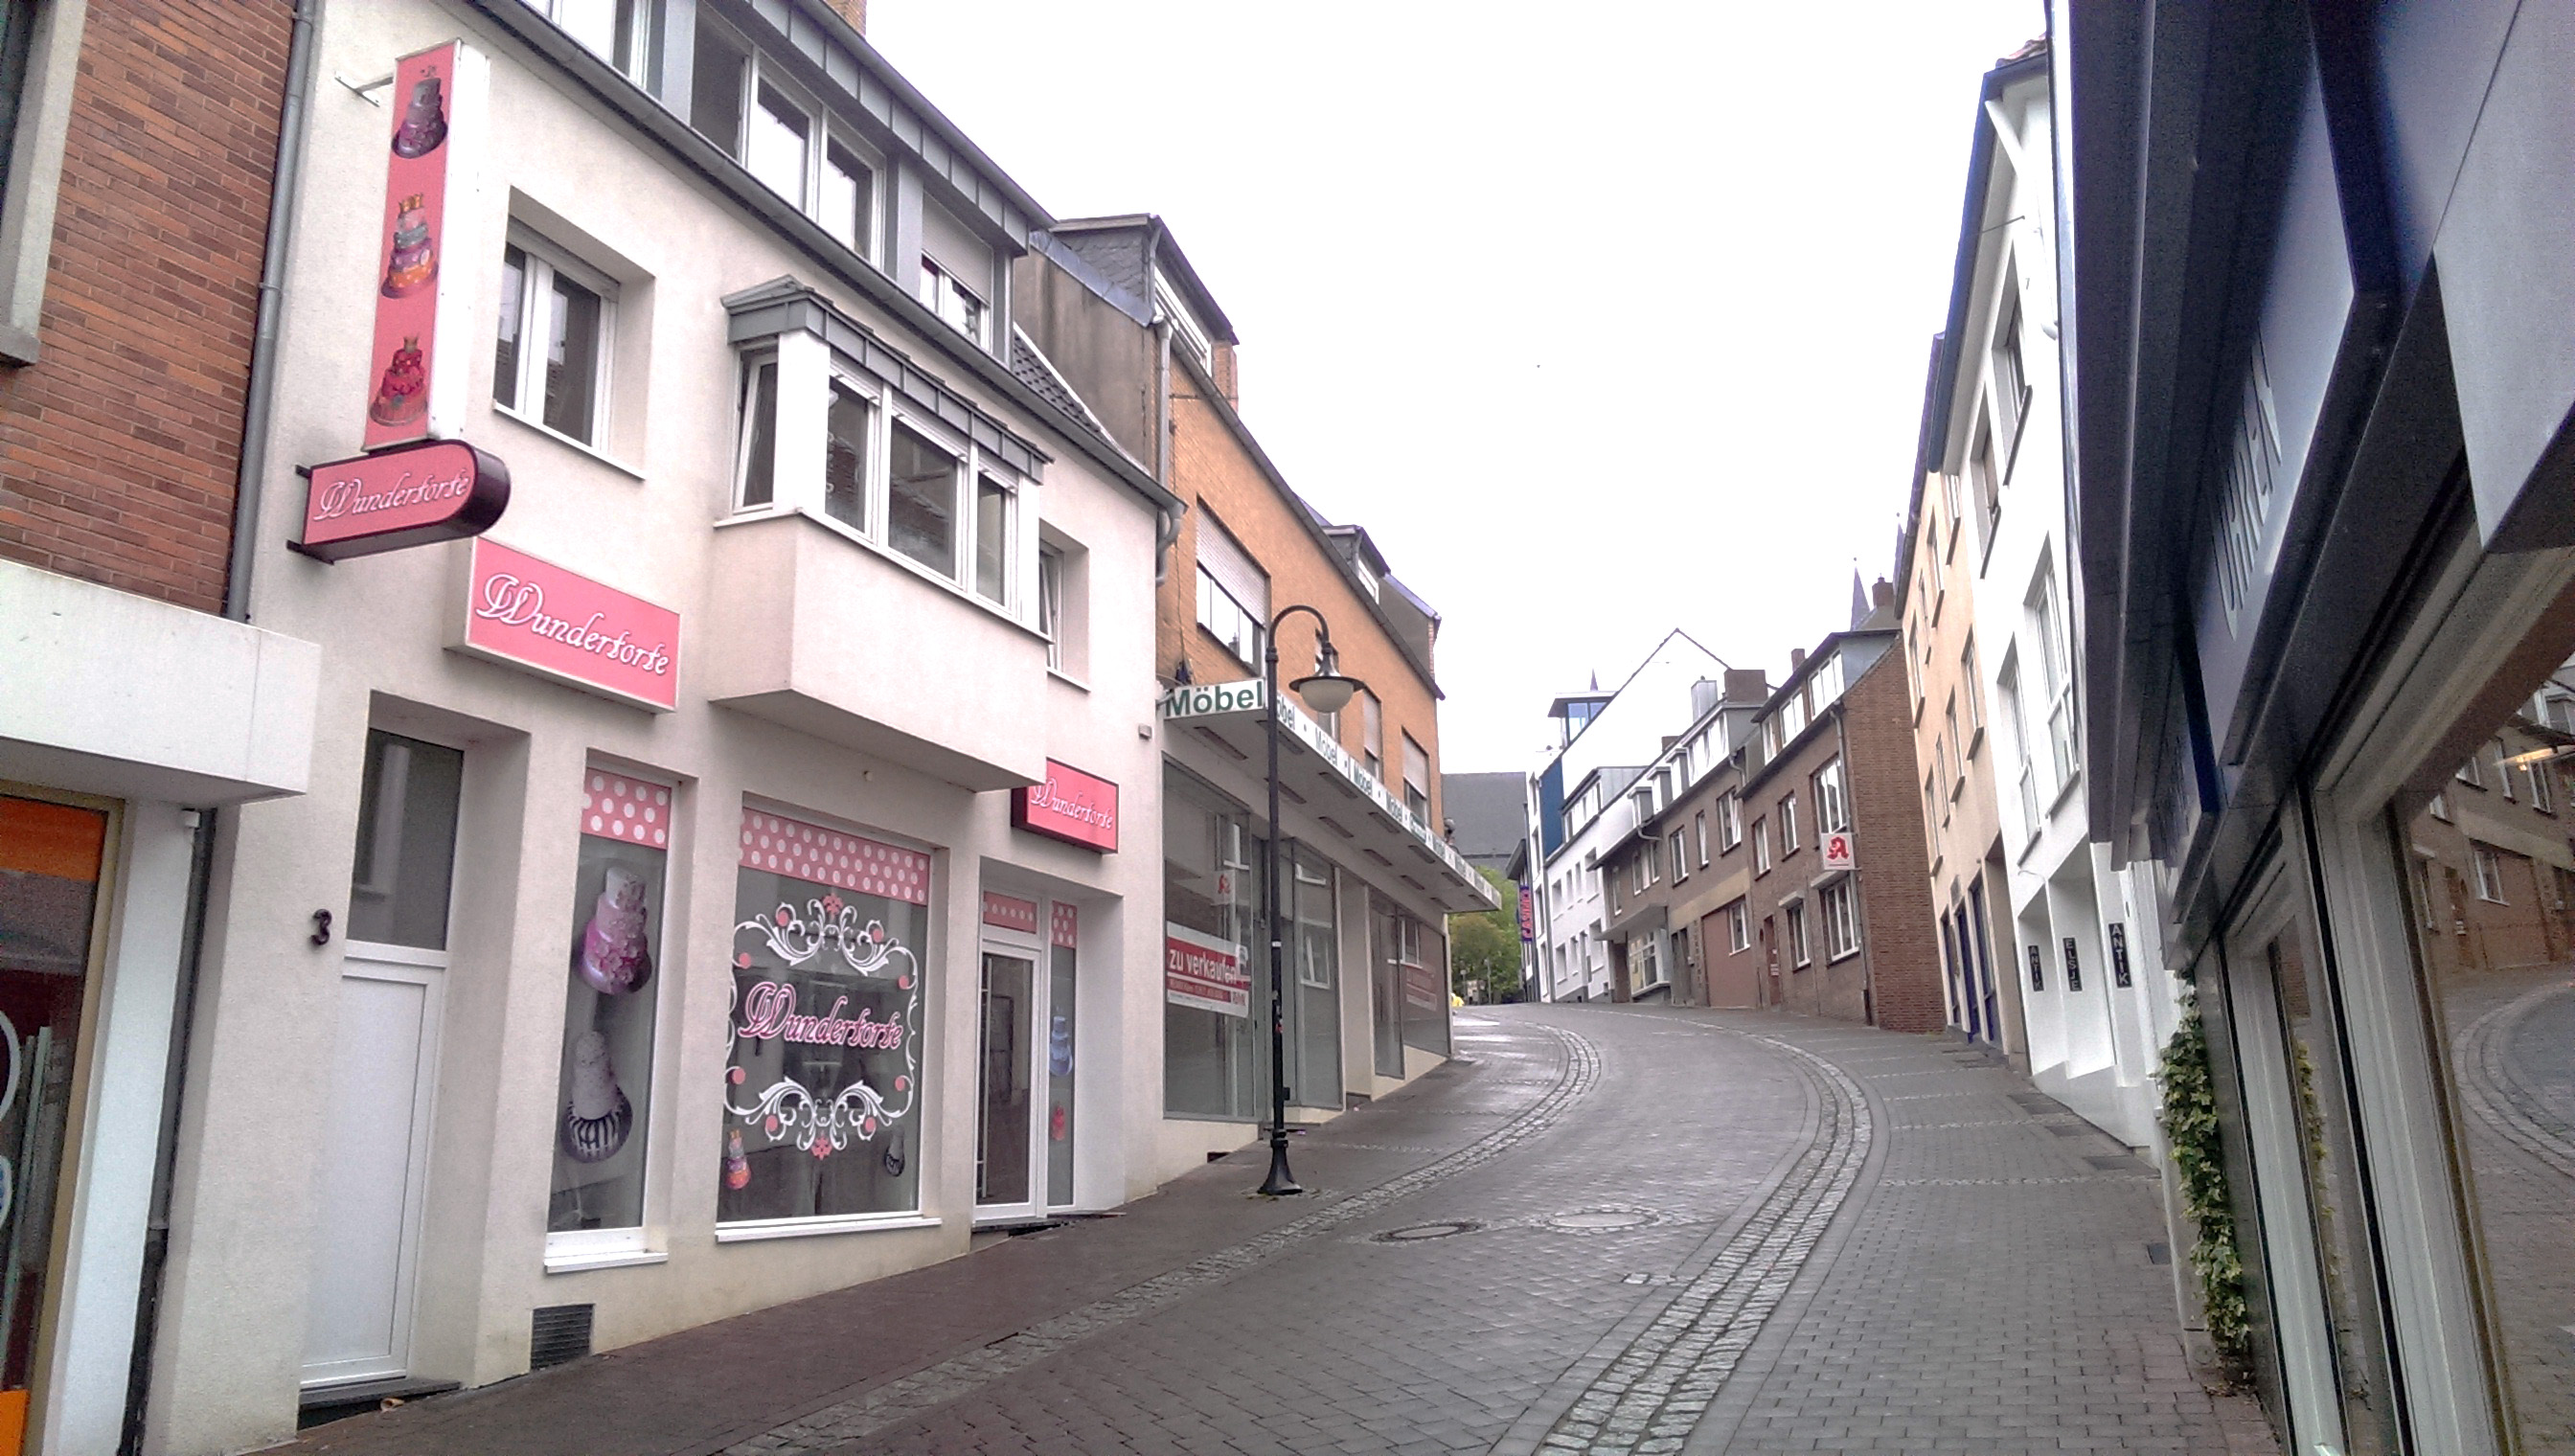 Bald Neu In Kleve Wundertorte Kirchstrasse 3 Klever